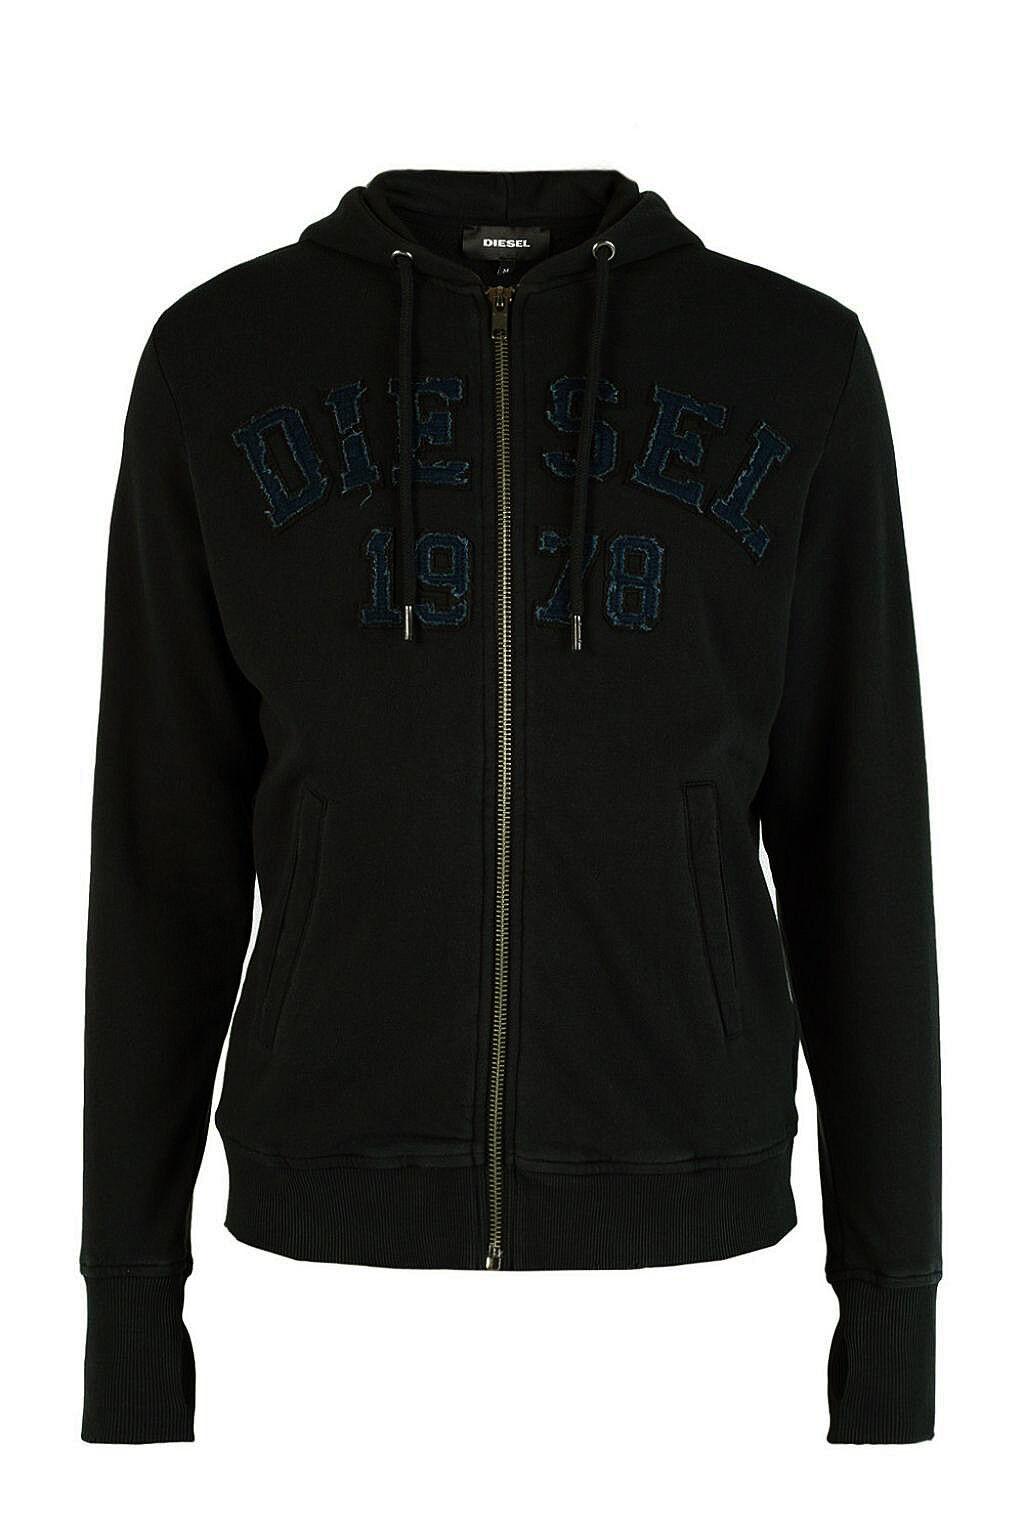 Authentic Rare DIESEL Men's Embroidered logo Hooded sweatshirt Cardigan